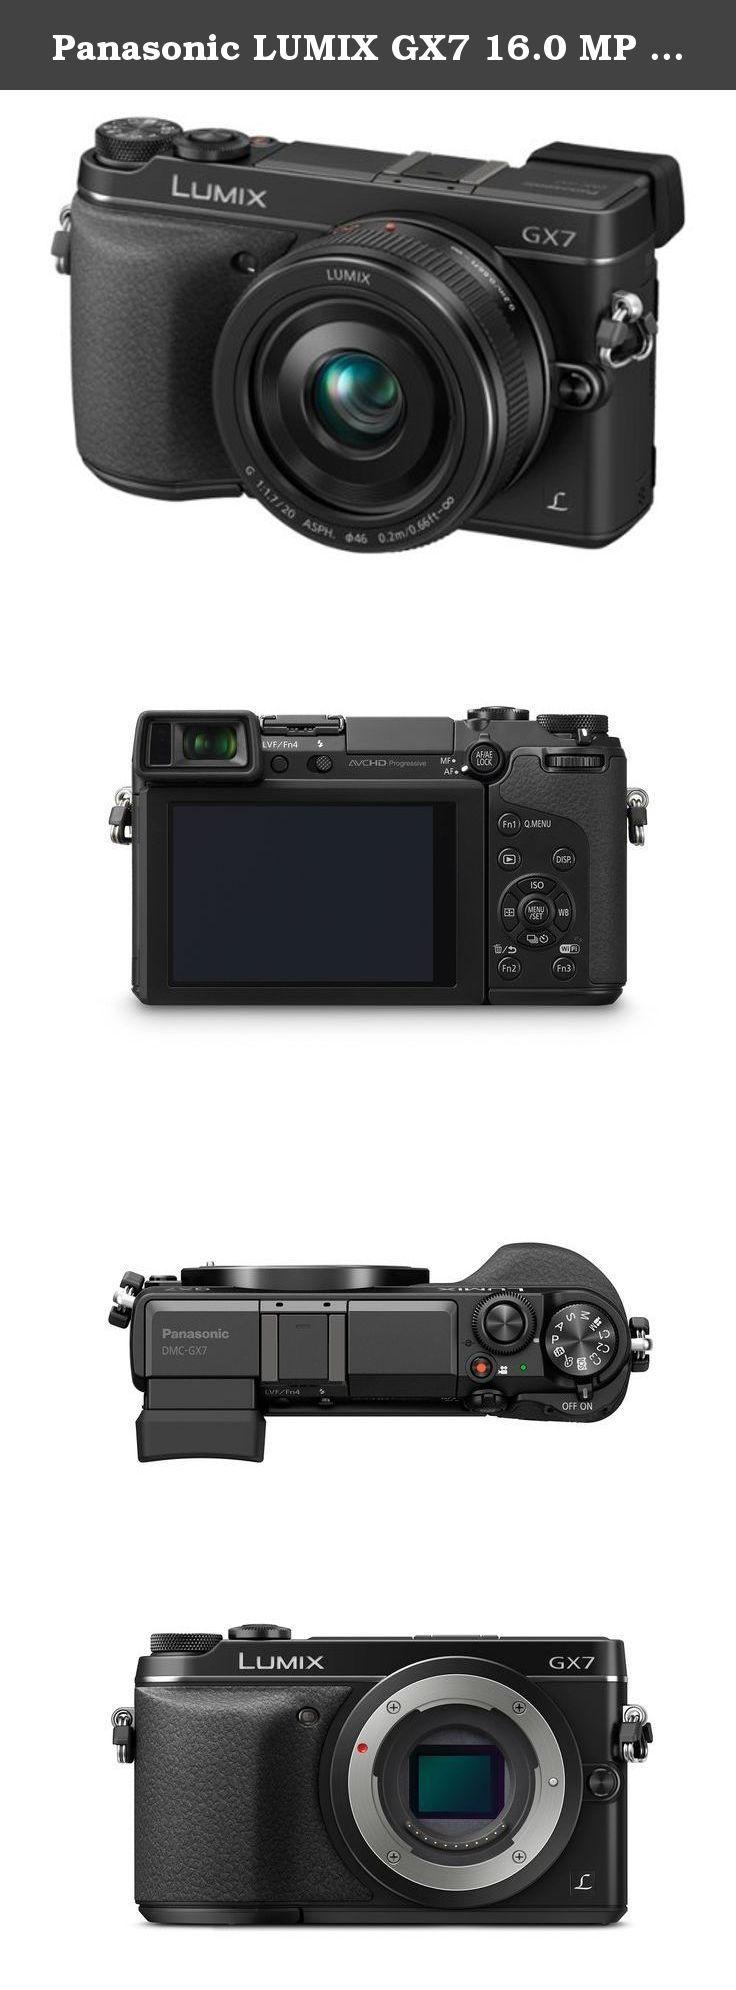 Panasonic Lumix Gx7 160 Mp Dslm Camera With G 20mm F17 Ii 25mm Asph Lens And Tilt Live Viewfinder Black The Dmc Mirrorless Micro